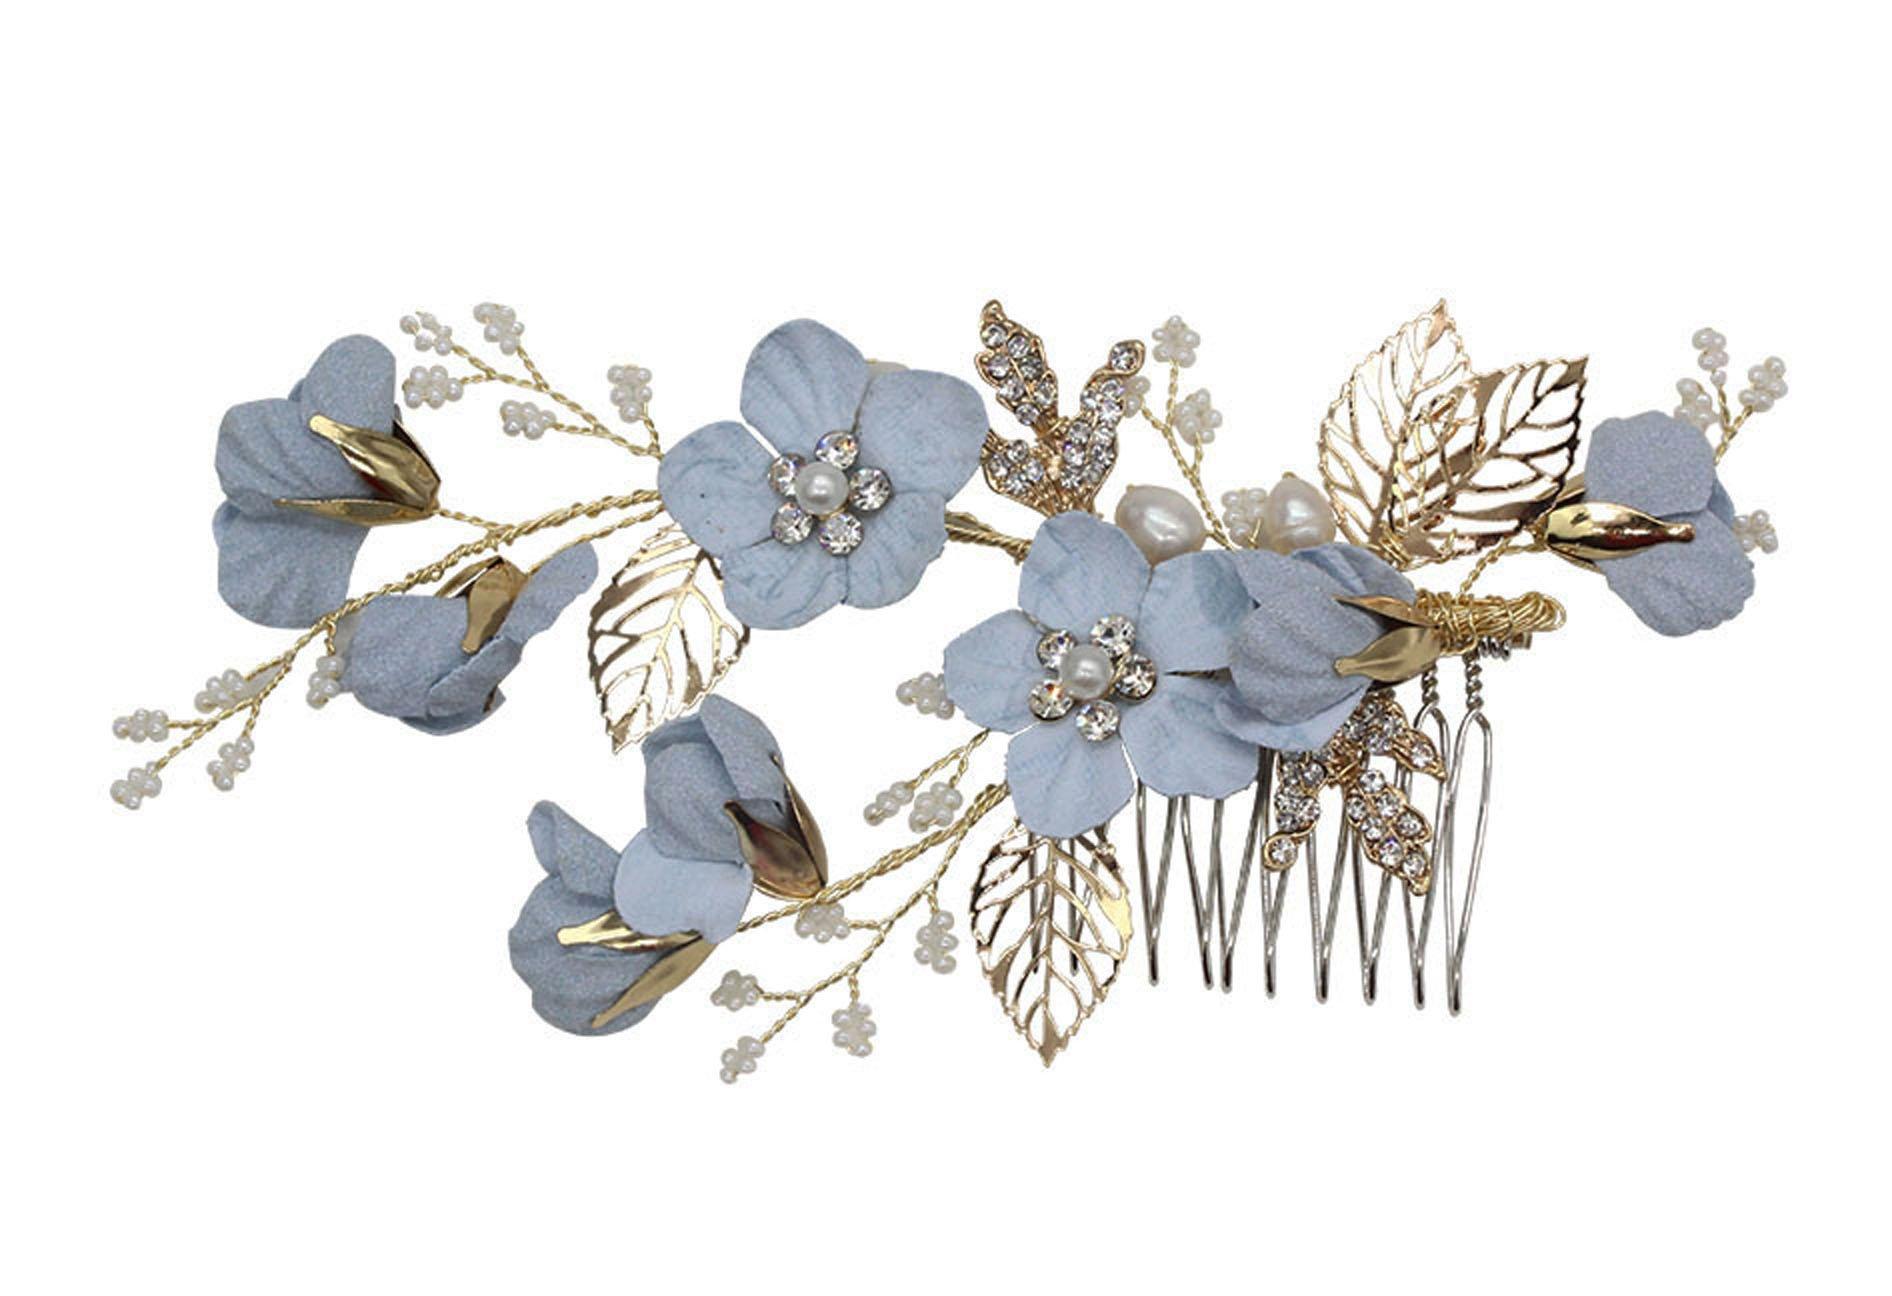 Vintage Blue Flower Crystal Pearl Side Combs Bridal Headpiece Wedding Hair Accessories (A) by MEiySH